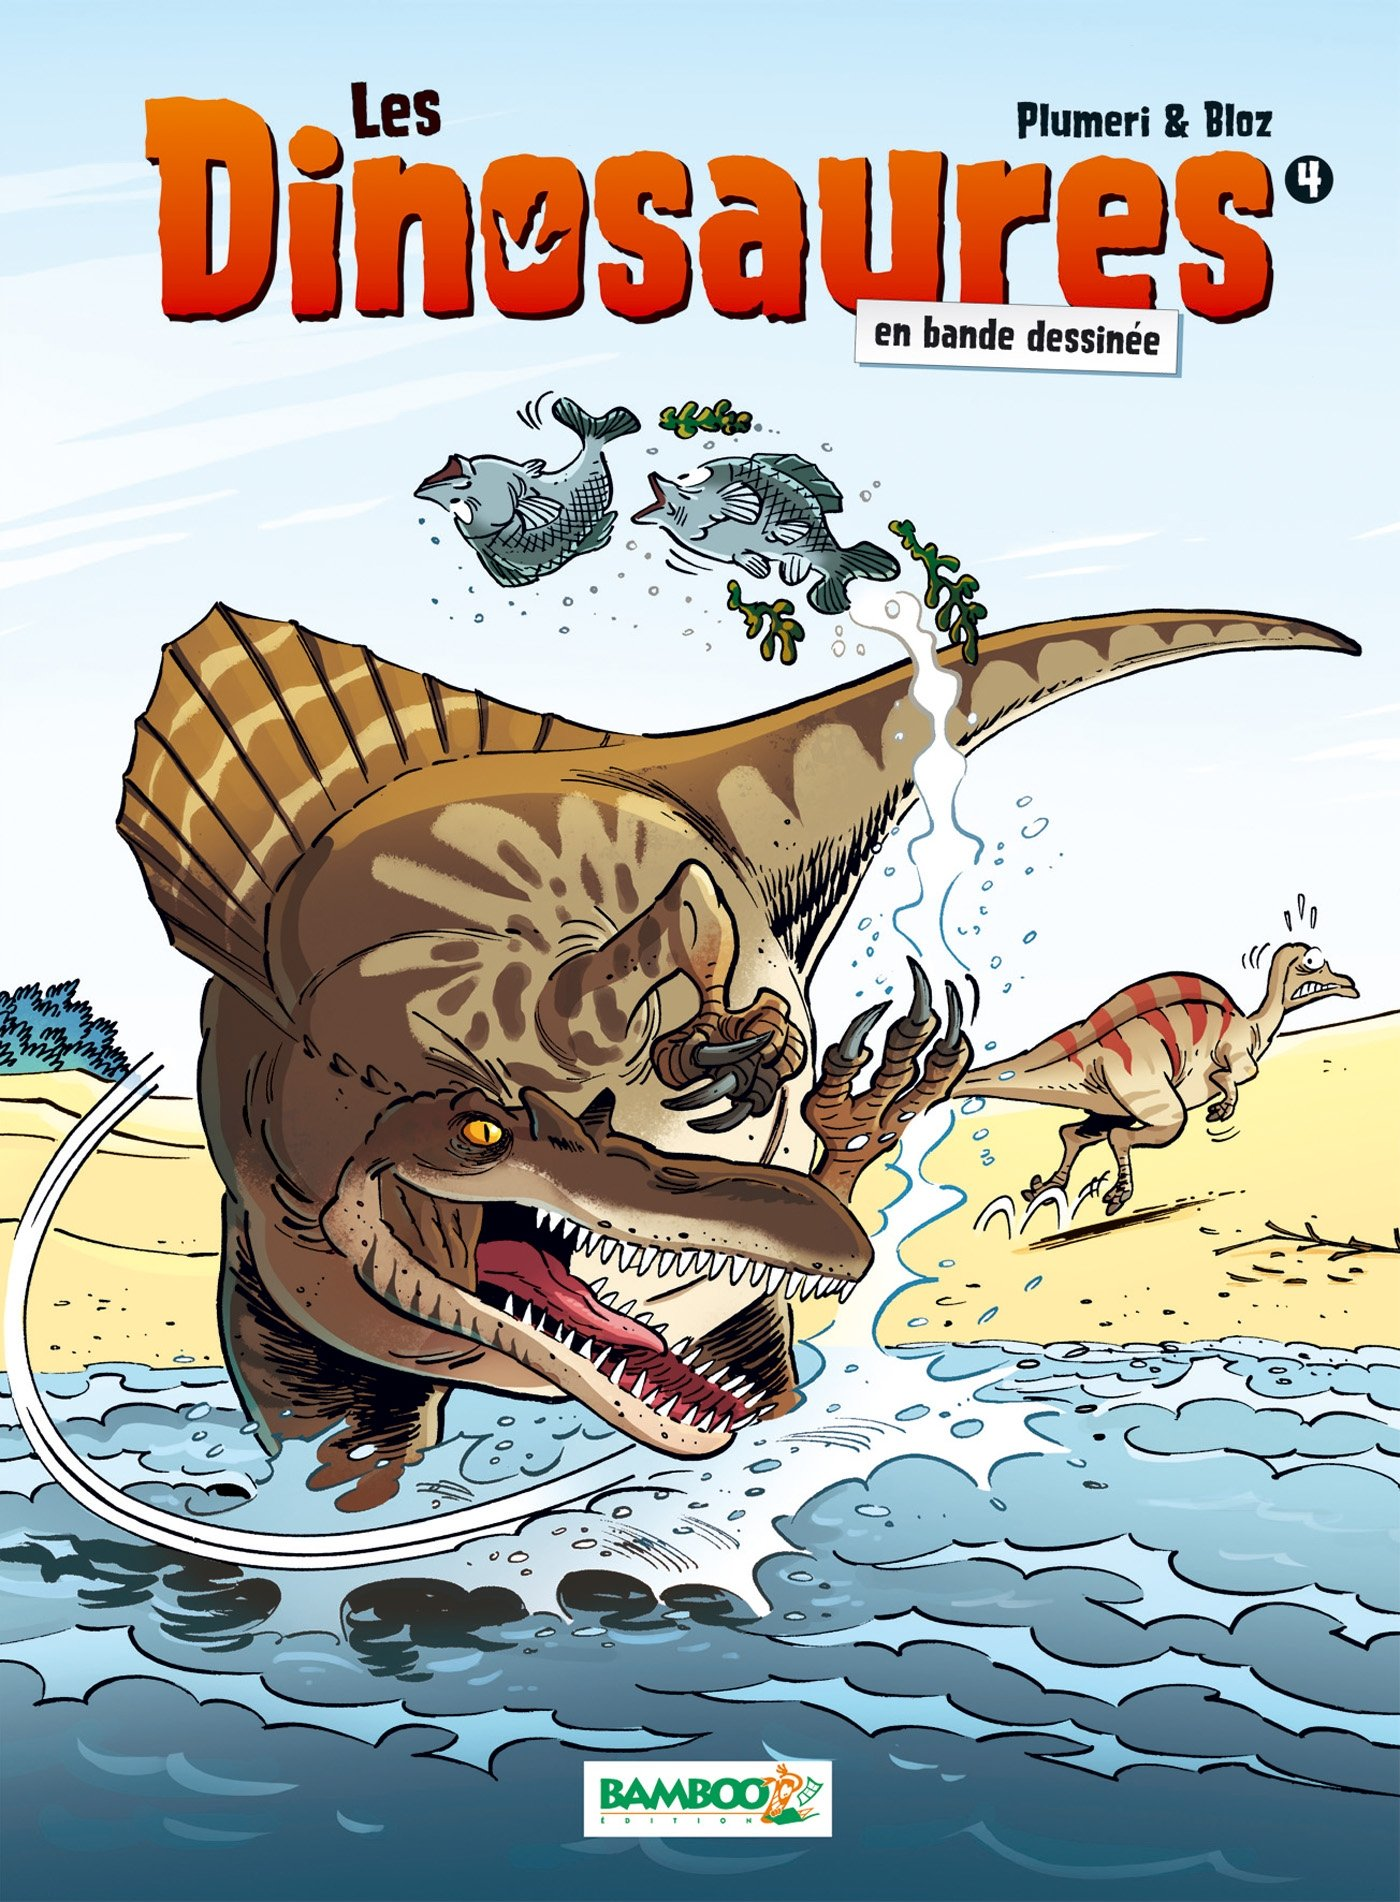 Les Dinosaures en BD - tome 4 Album – 10 septembre 2014 Arnaud Plumeri Bloz Bamboo 2818931061